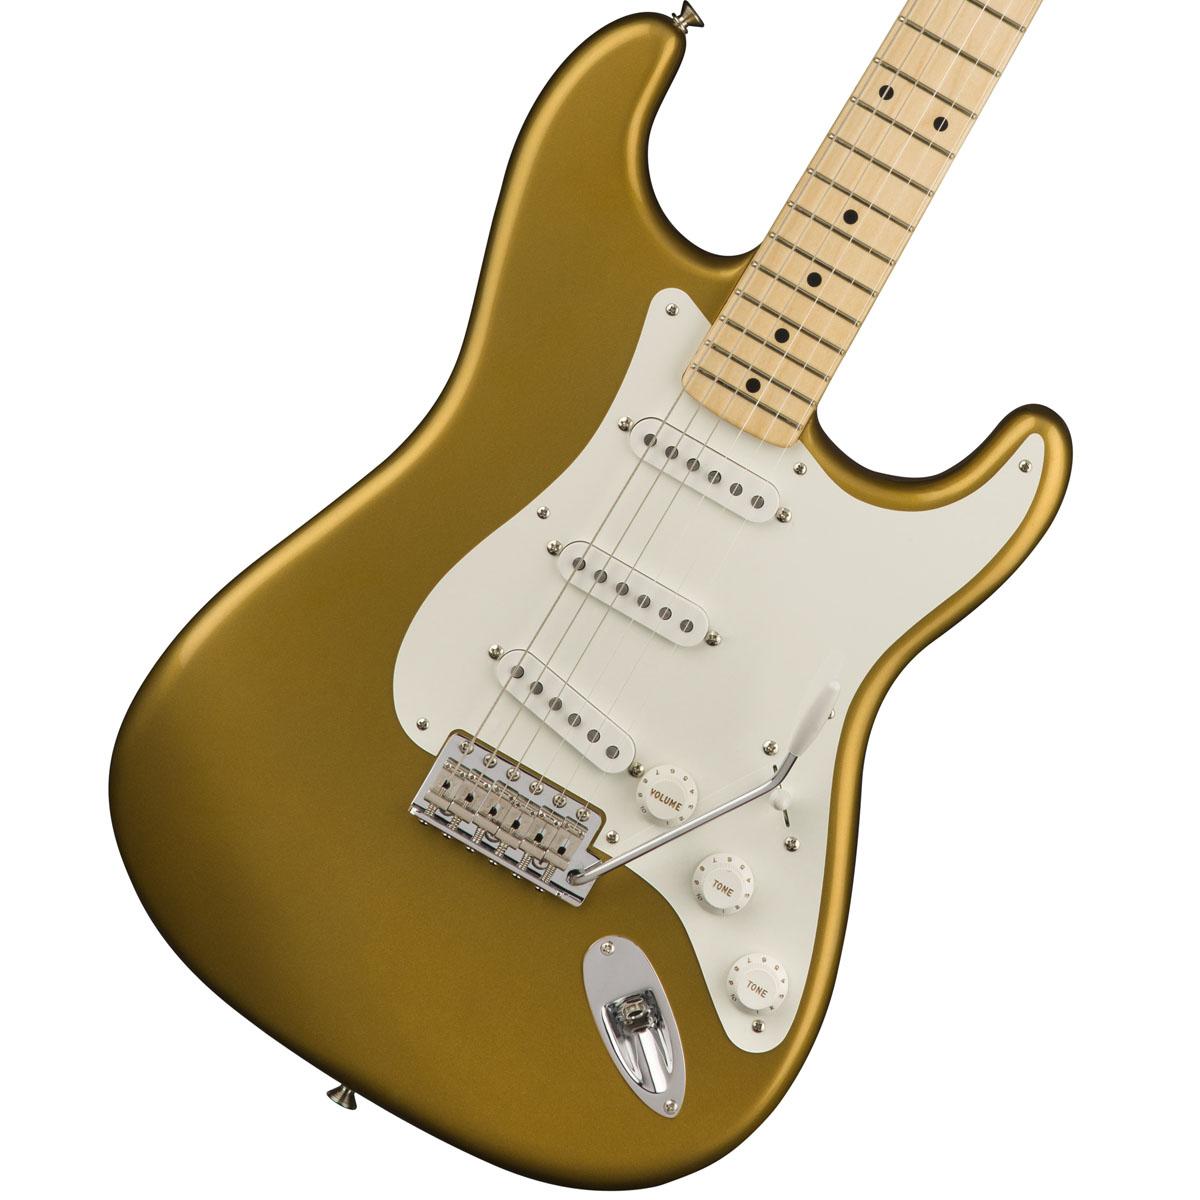 Fender USA / American Original 50s Stratocaster Aztec Gold 《カスタムショップのお手入れ用品を進呈/+671038200》【YRK】